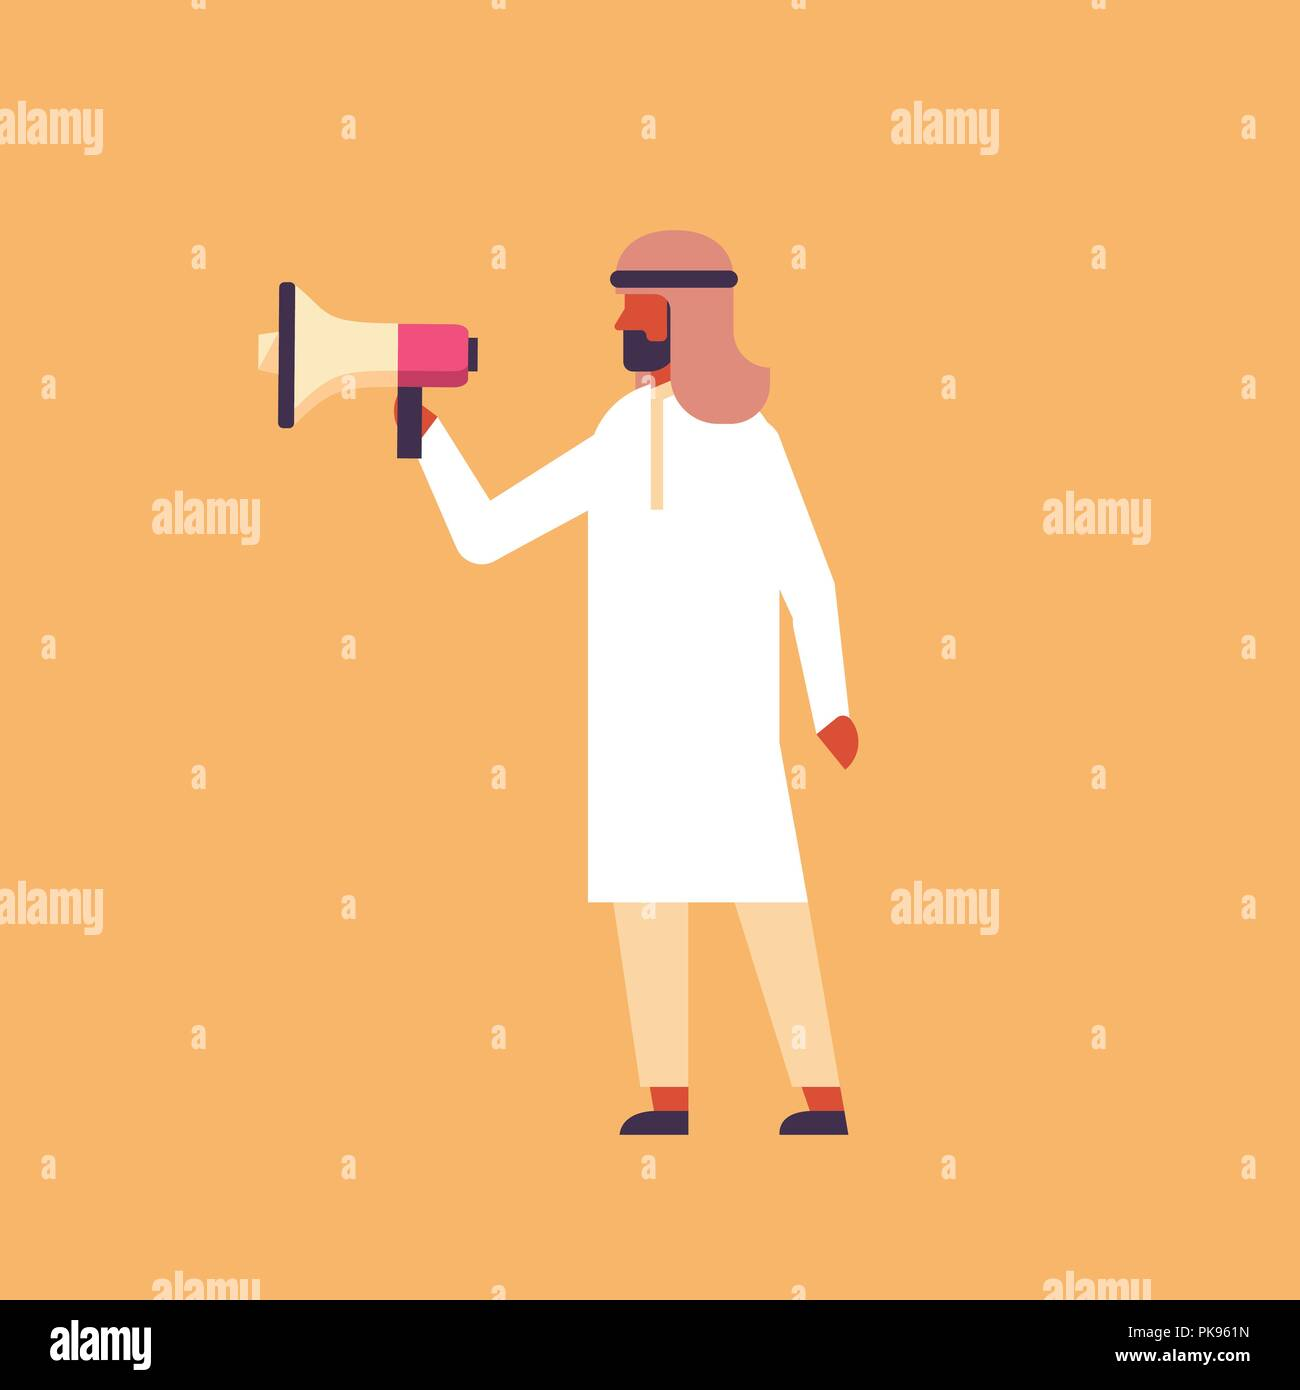 arabic businessman holding megaphone announcement concept arab man speaker information advertising loudspeaker leadership cartoon character flat full length - Stock Image